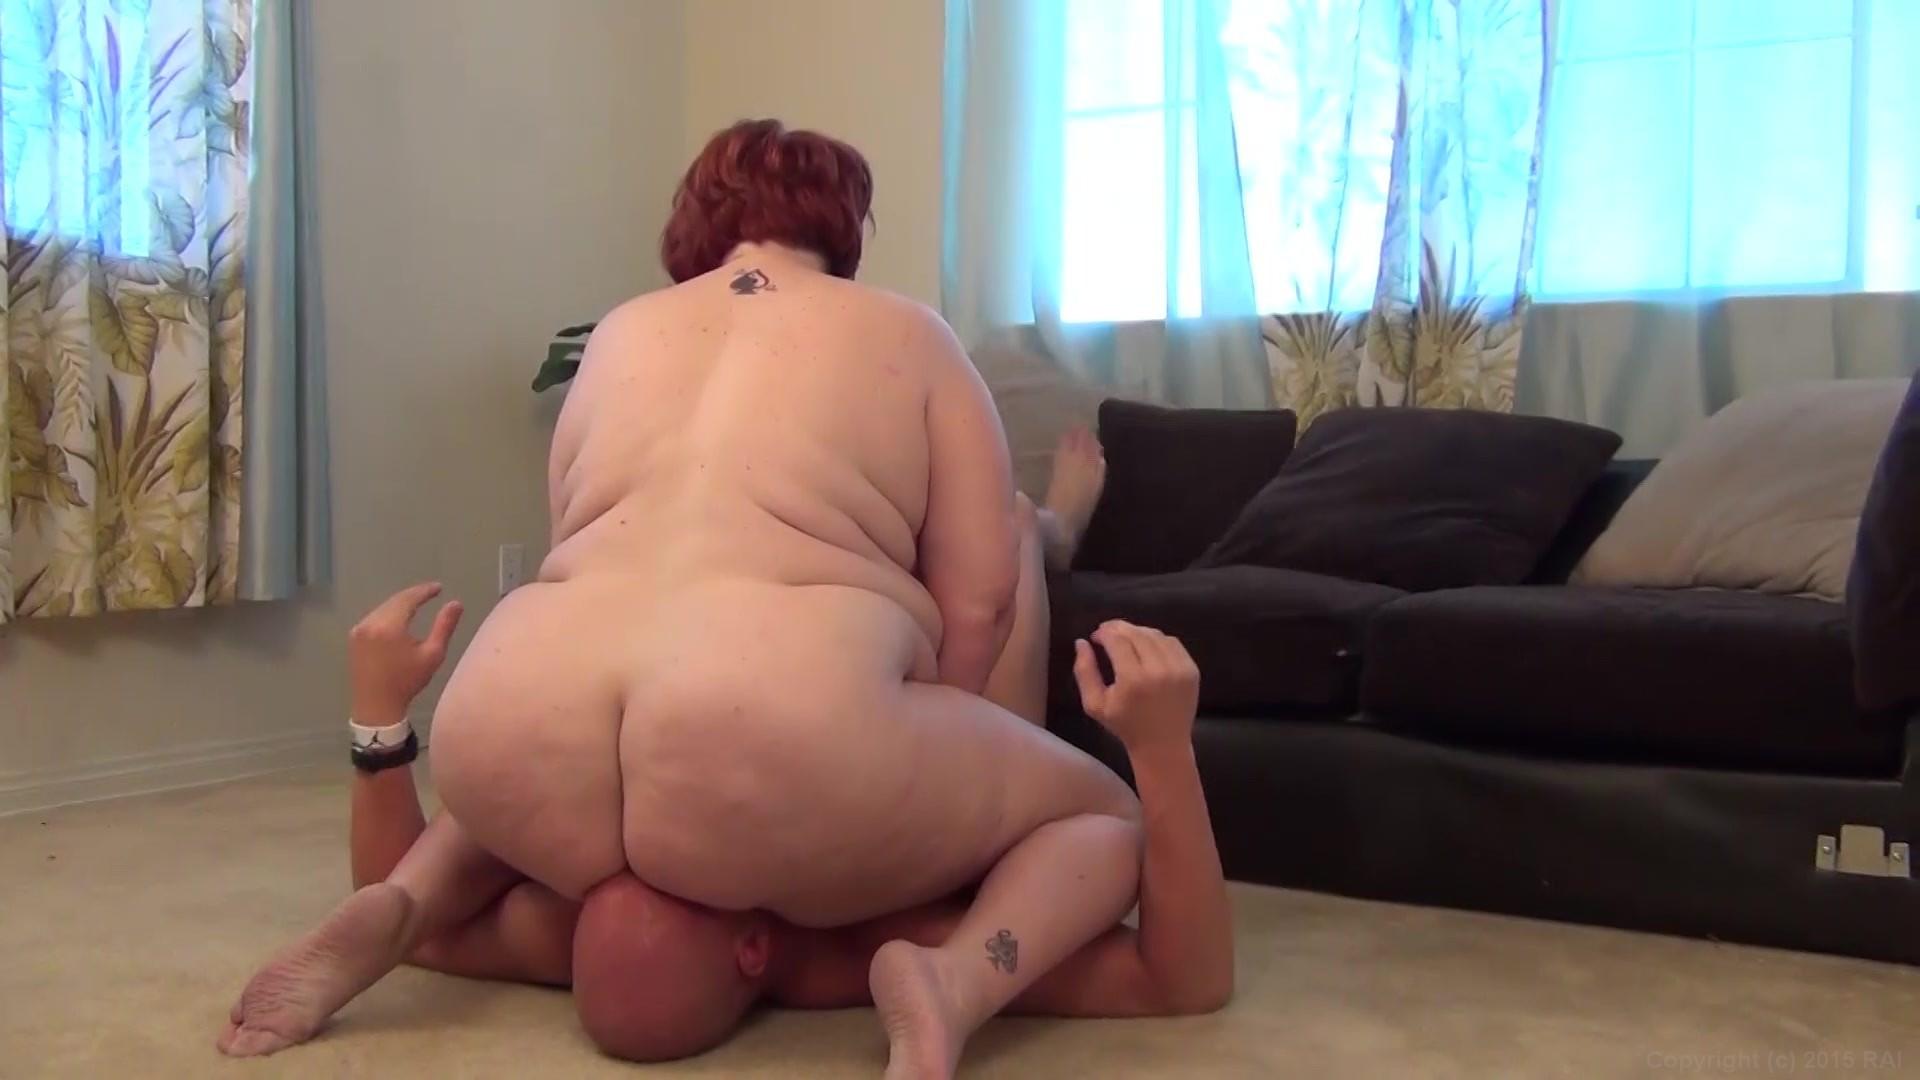 Chubby girl facesitting fuck face slave girl